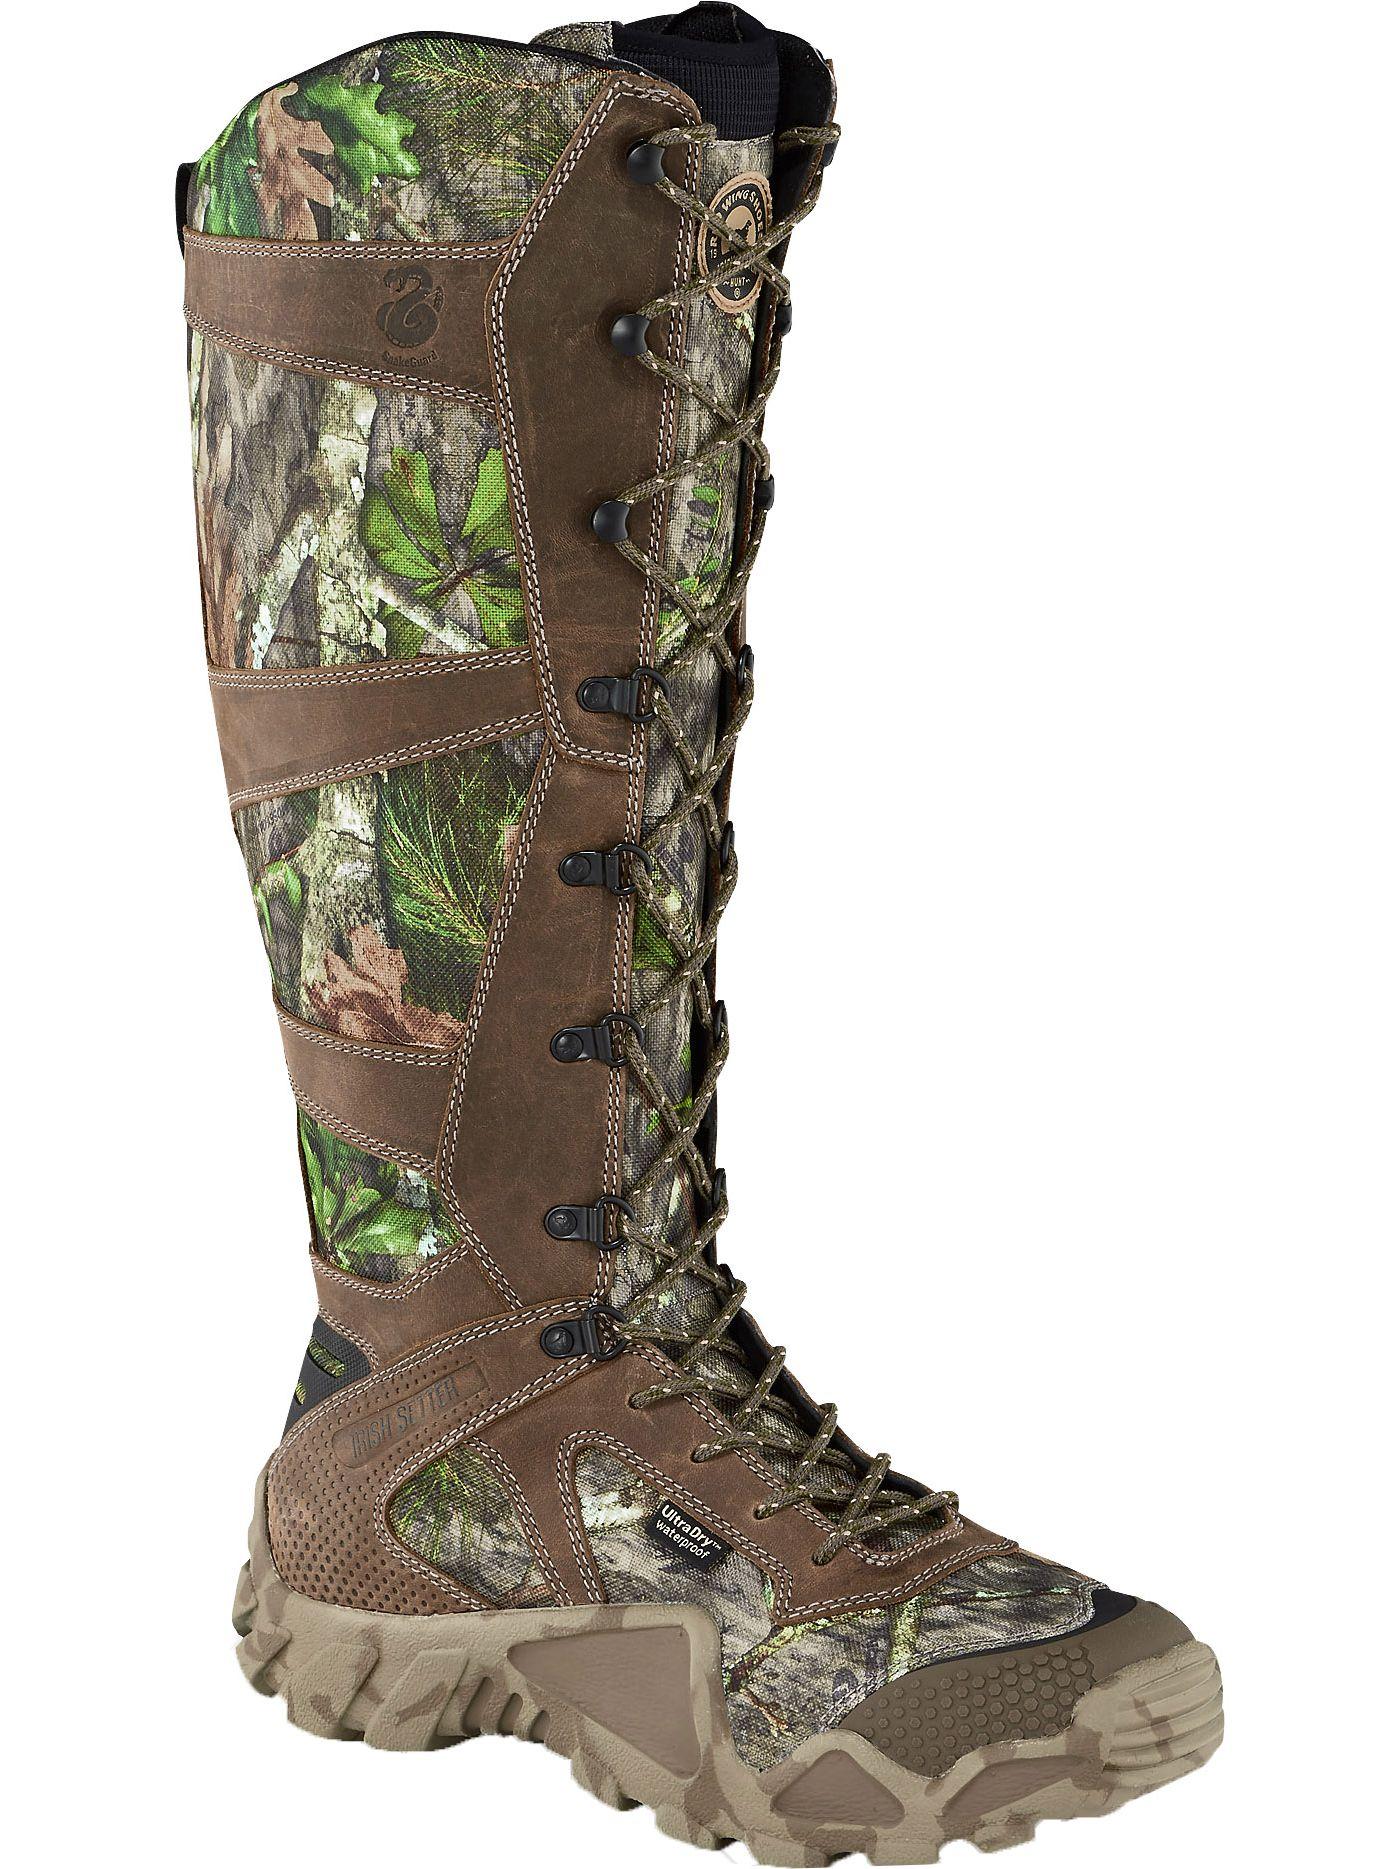 Irish Setter Men's Vaprtrek 17'' Snakeproof Waterproof Field Hunting Boots